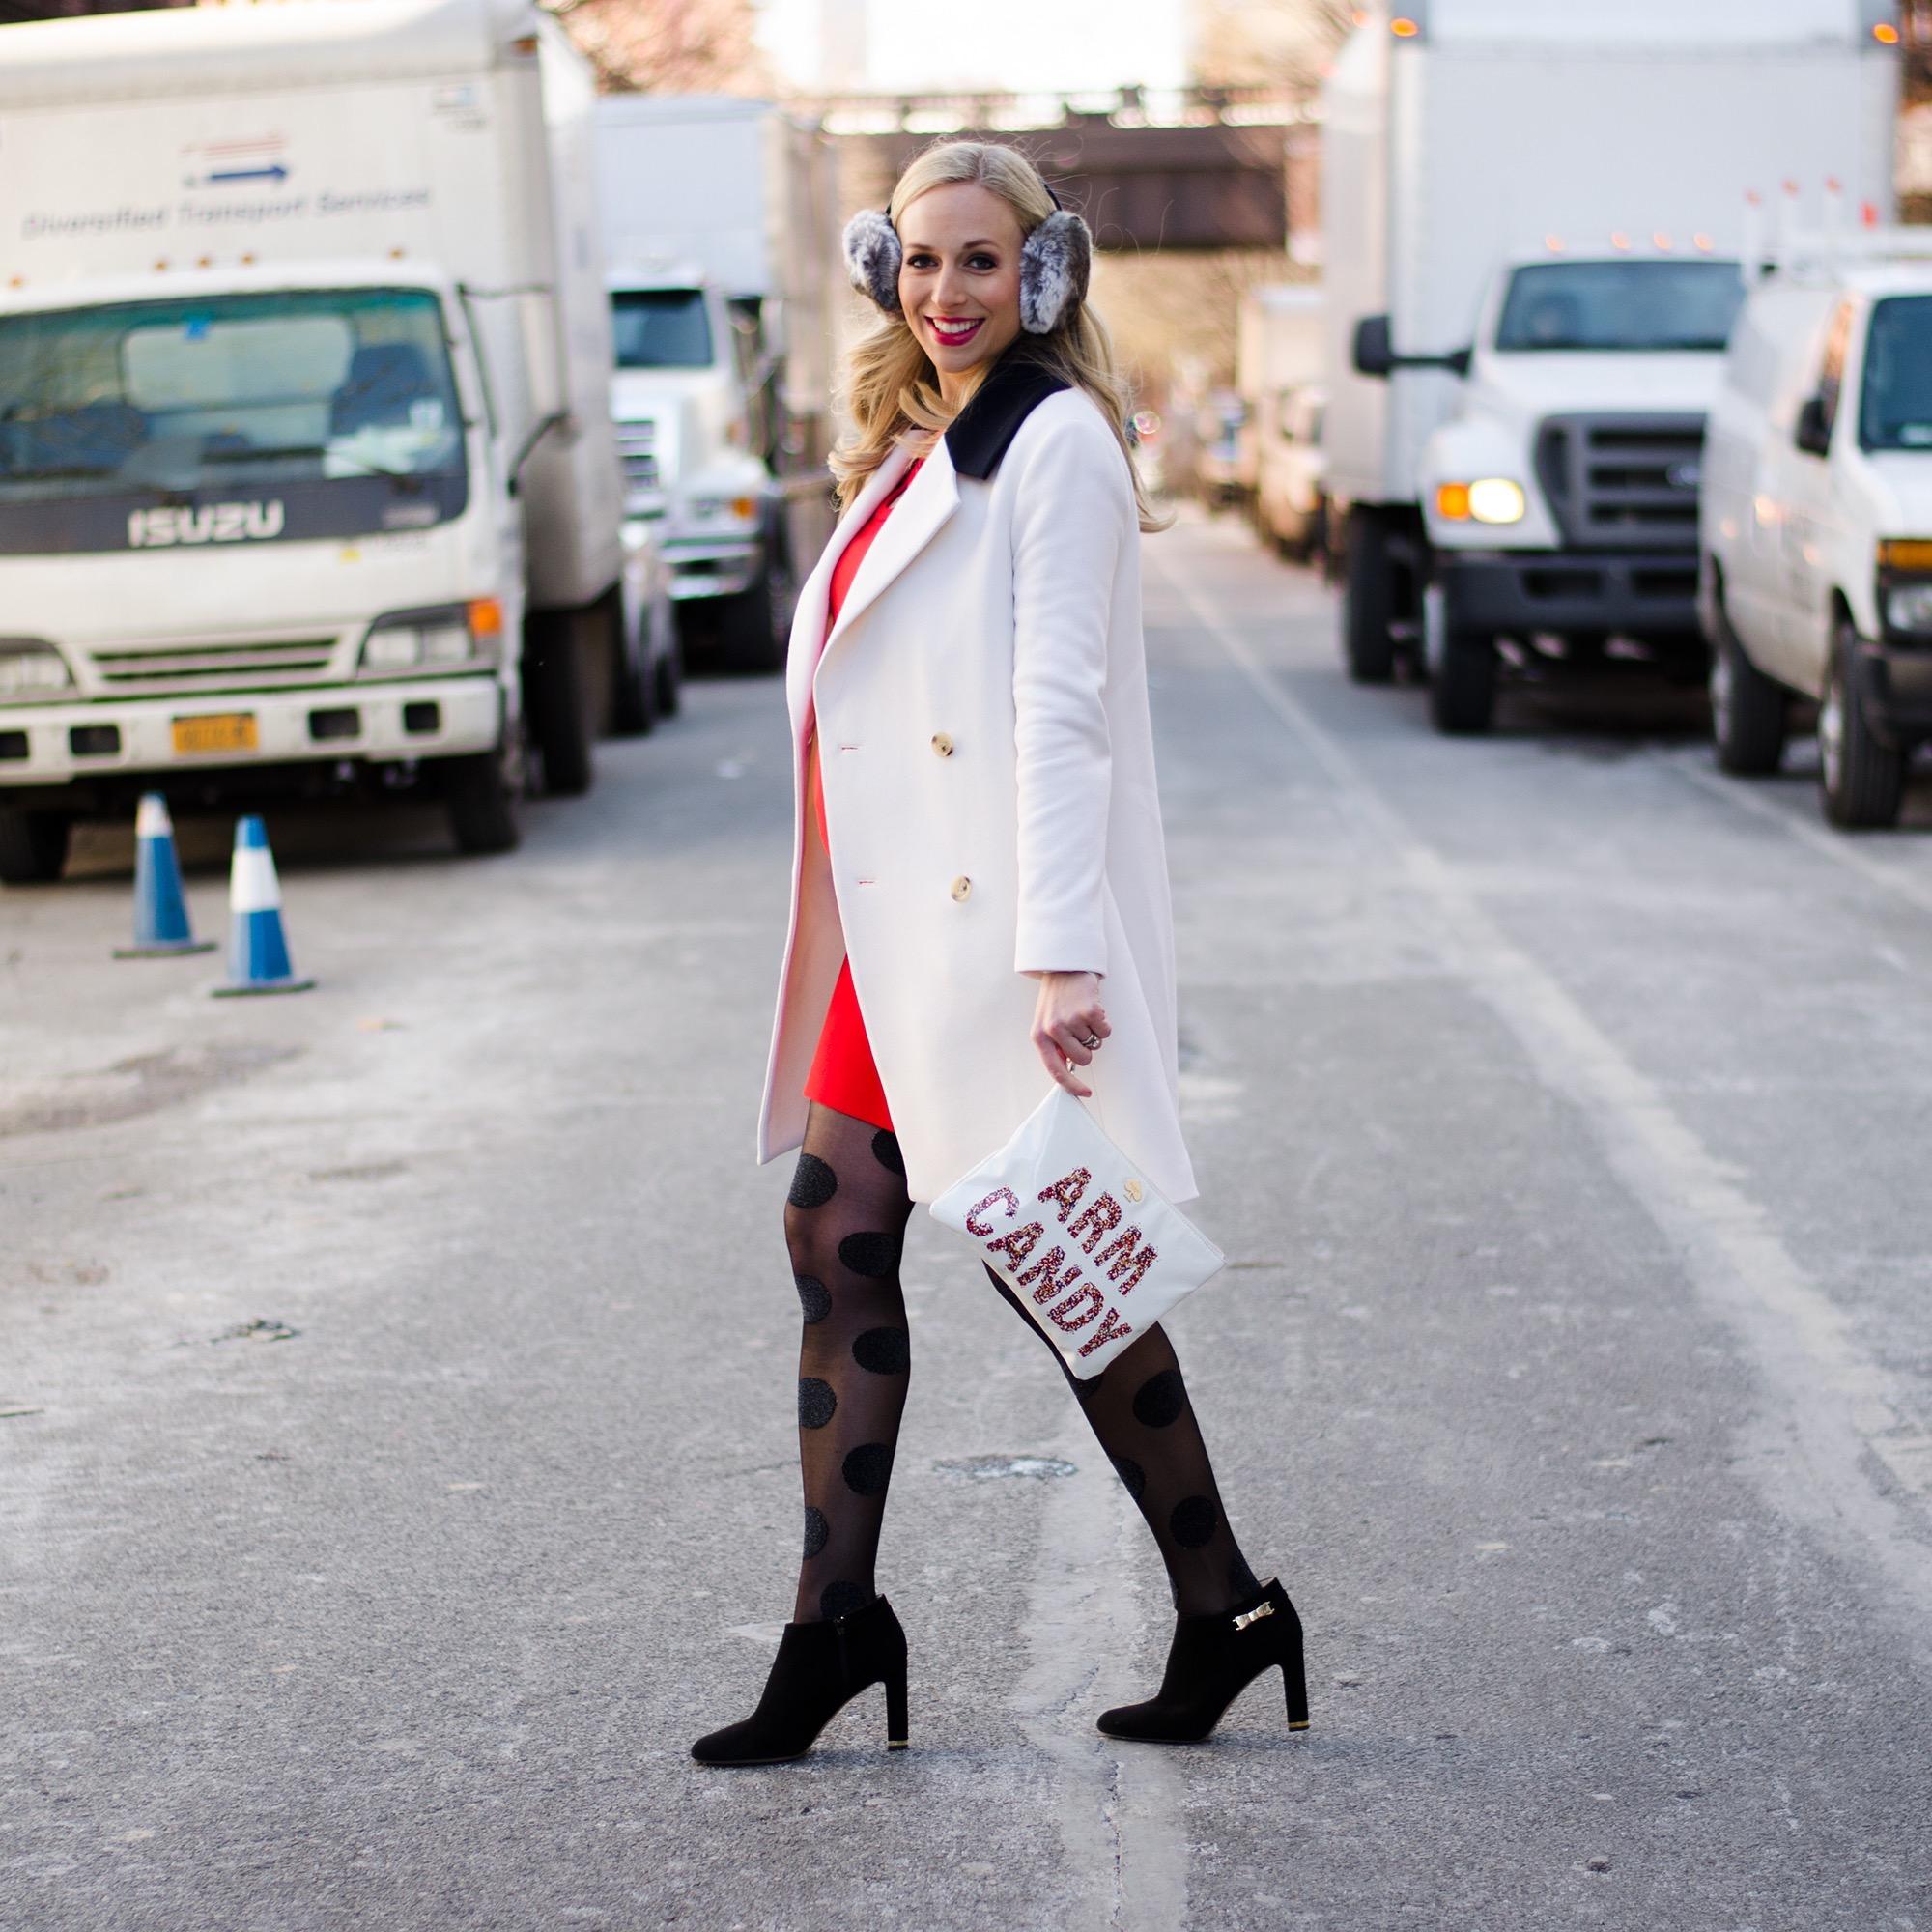 #tbt to Kate Spade Presentation at New York Fashion Week